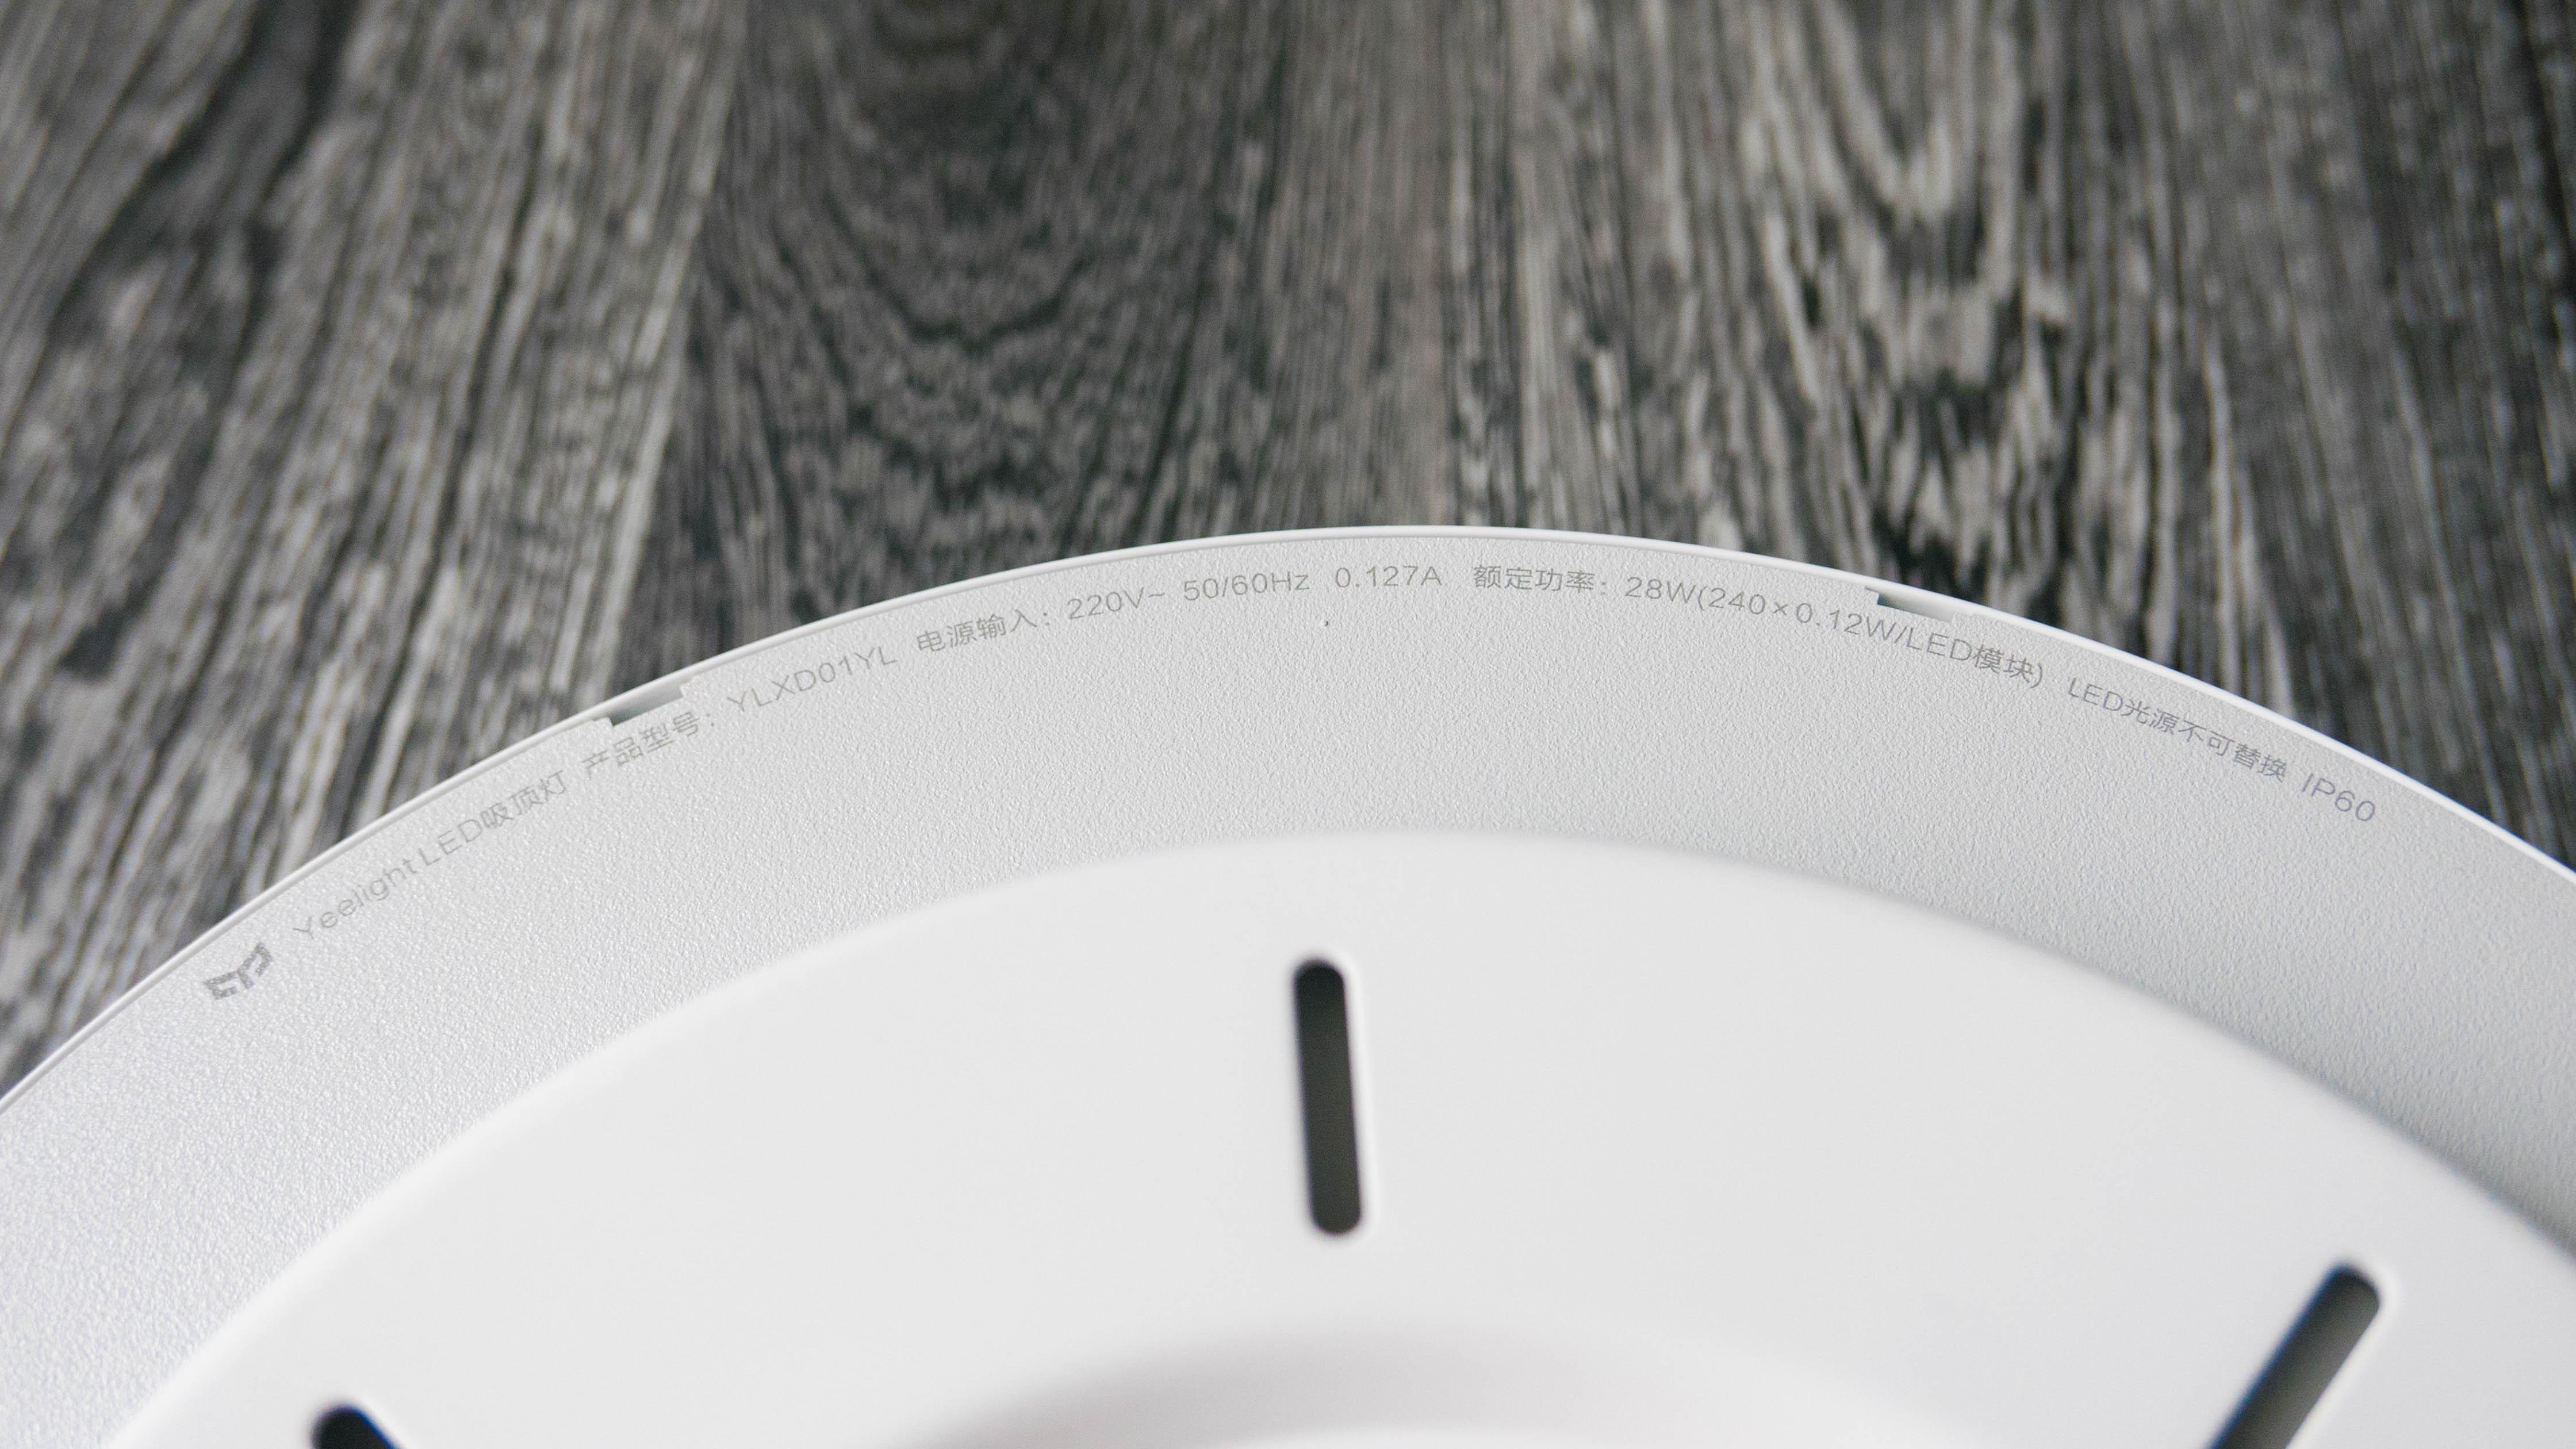 Xiaomi Yeelight LED Ceiling Light 11